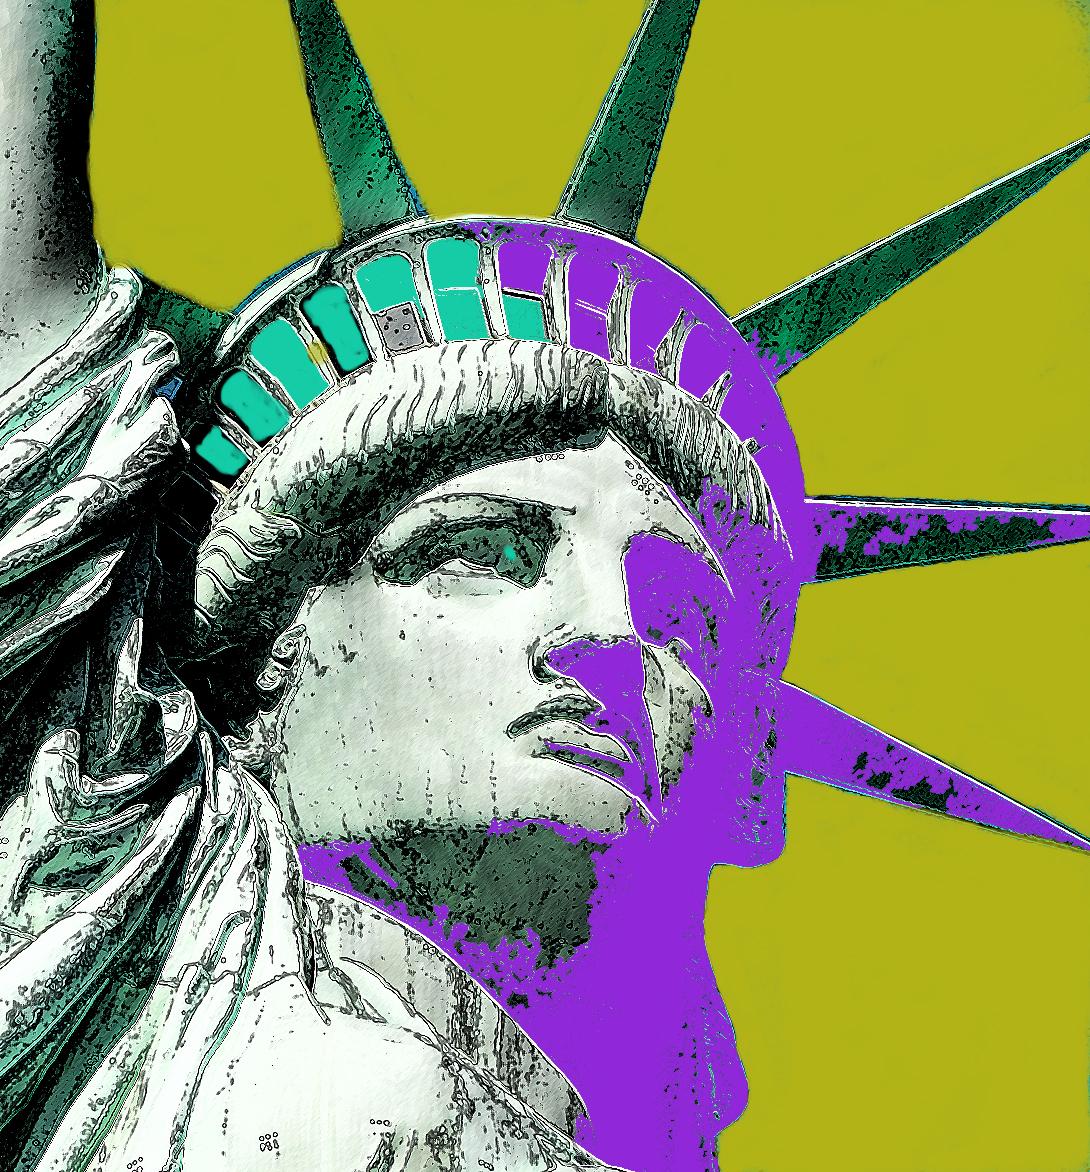 Style 5 - Purple/Green